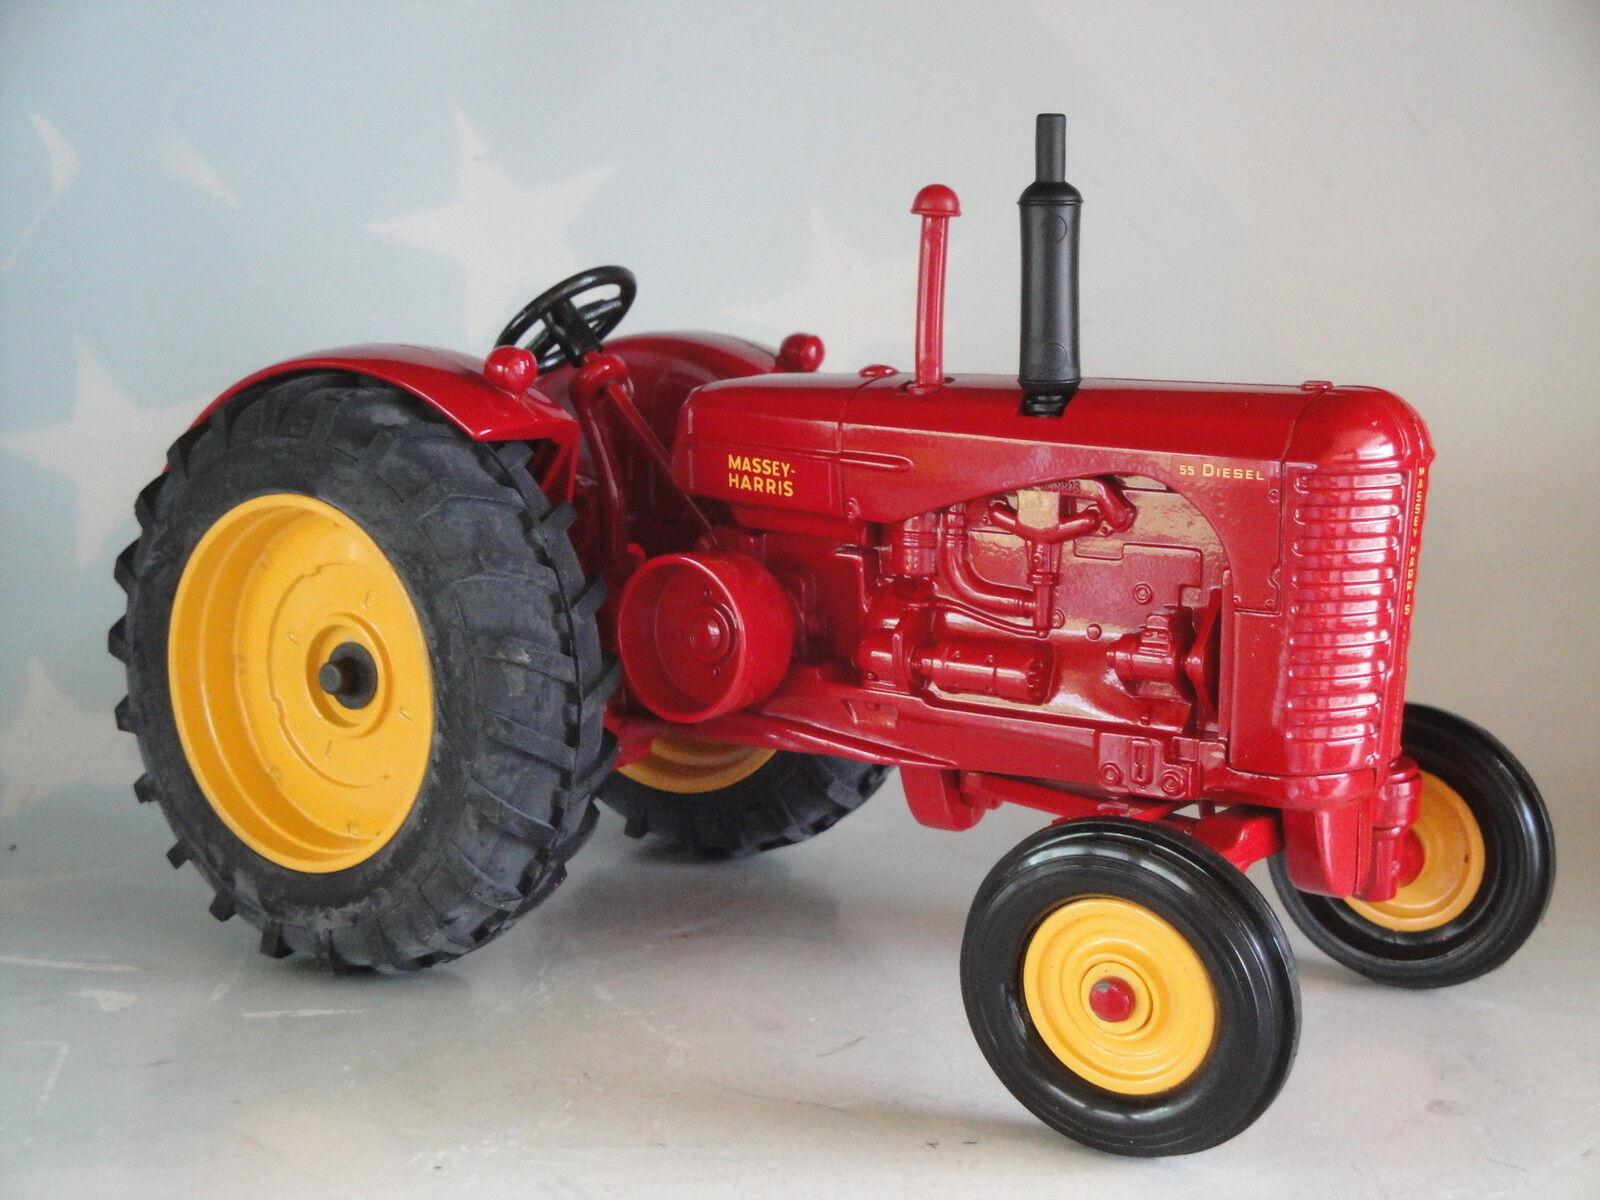 Massey Harris amplia amplia amplia frontal Tractor 55 Diesel 1 16 Juguete Granjero Ertl Diecast 1292-PA 4b921a